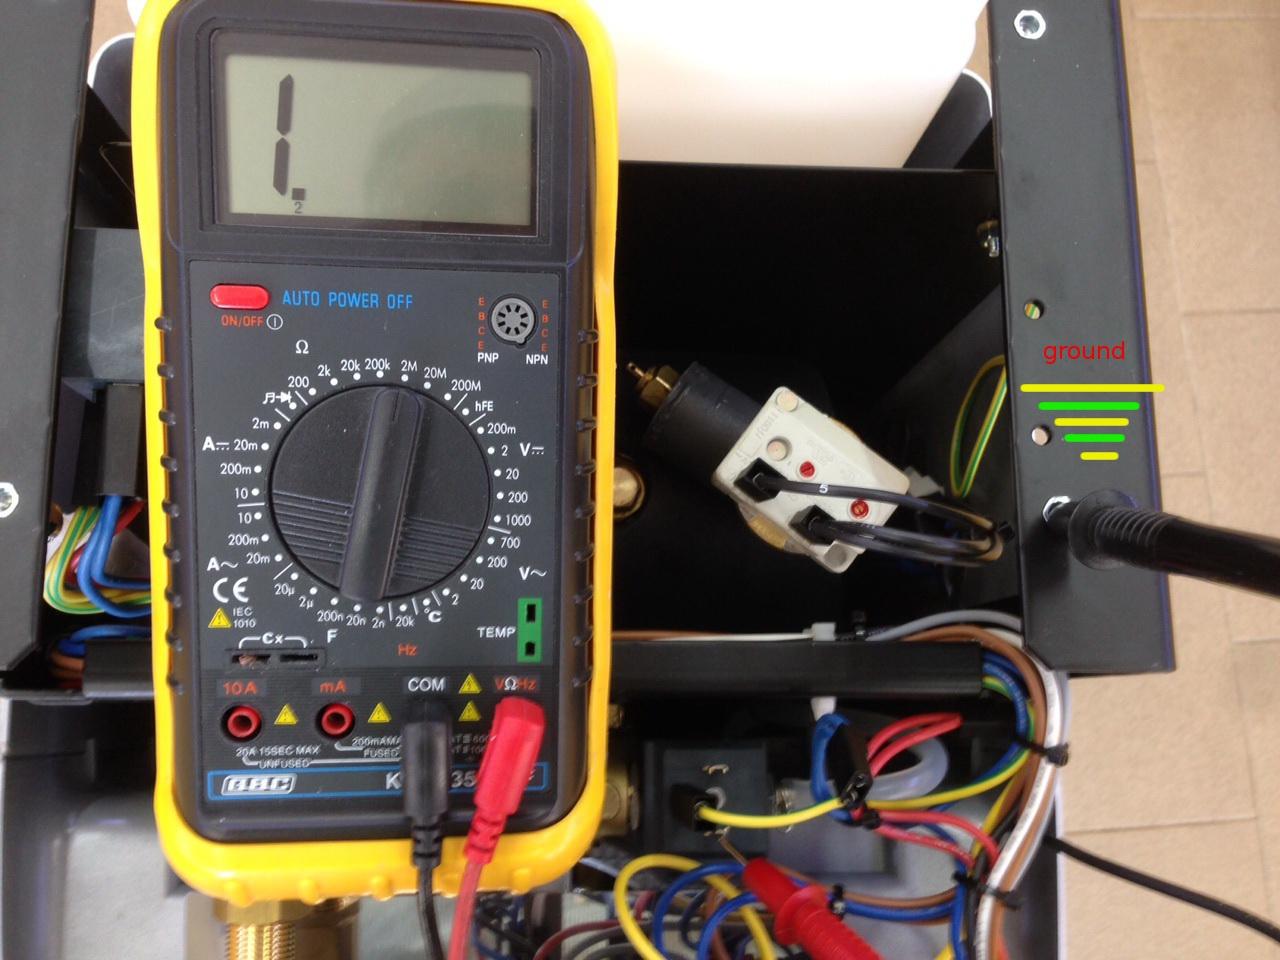 Elektros Vendita Online Macchine Da Caff Rcd 200 Wiring Diagram 3 Ways Solenoid Valve